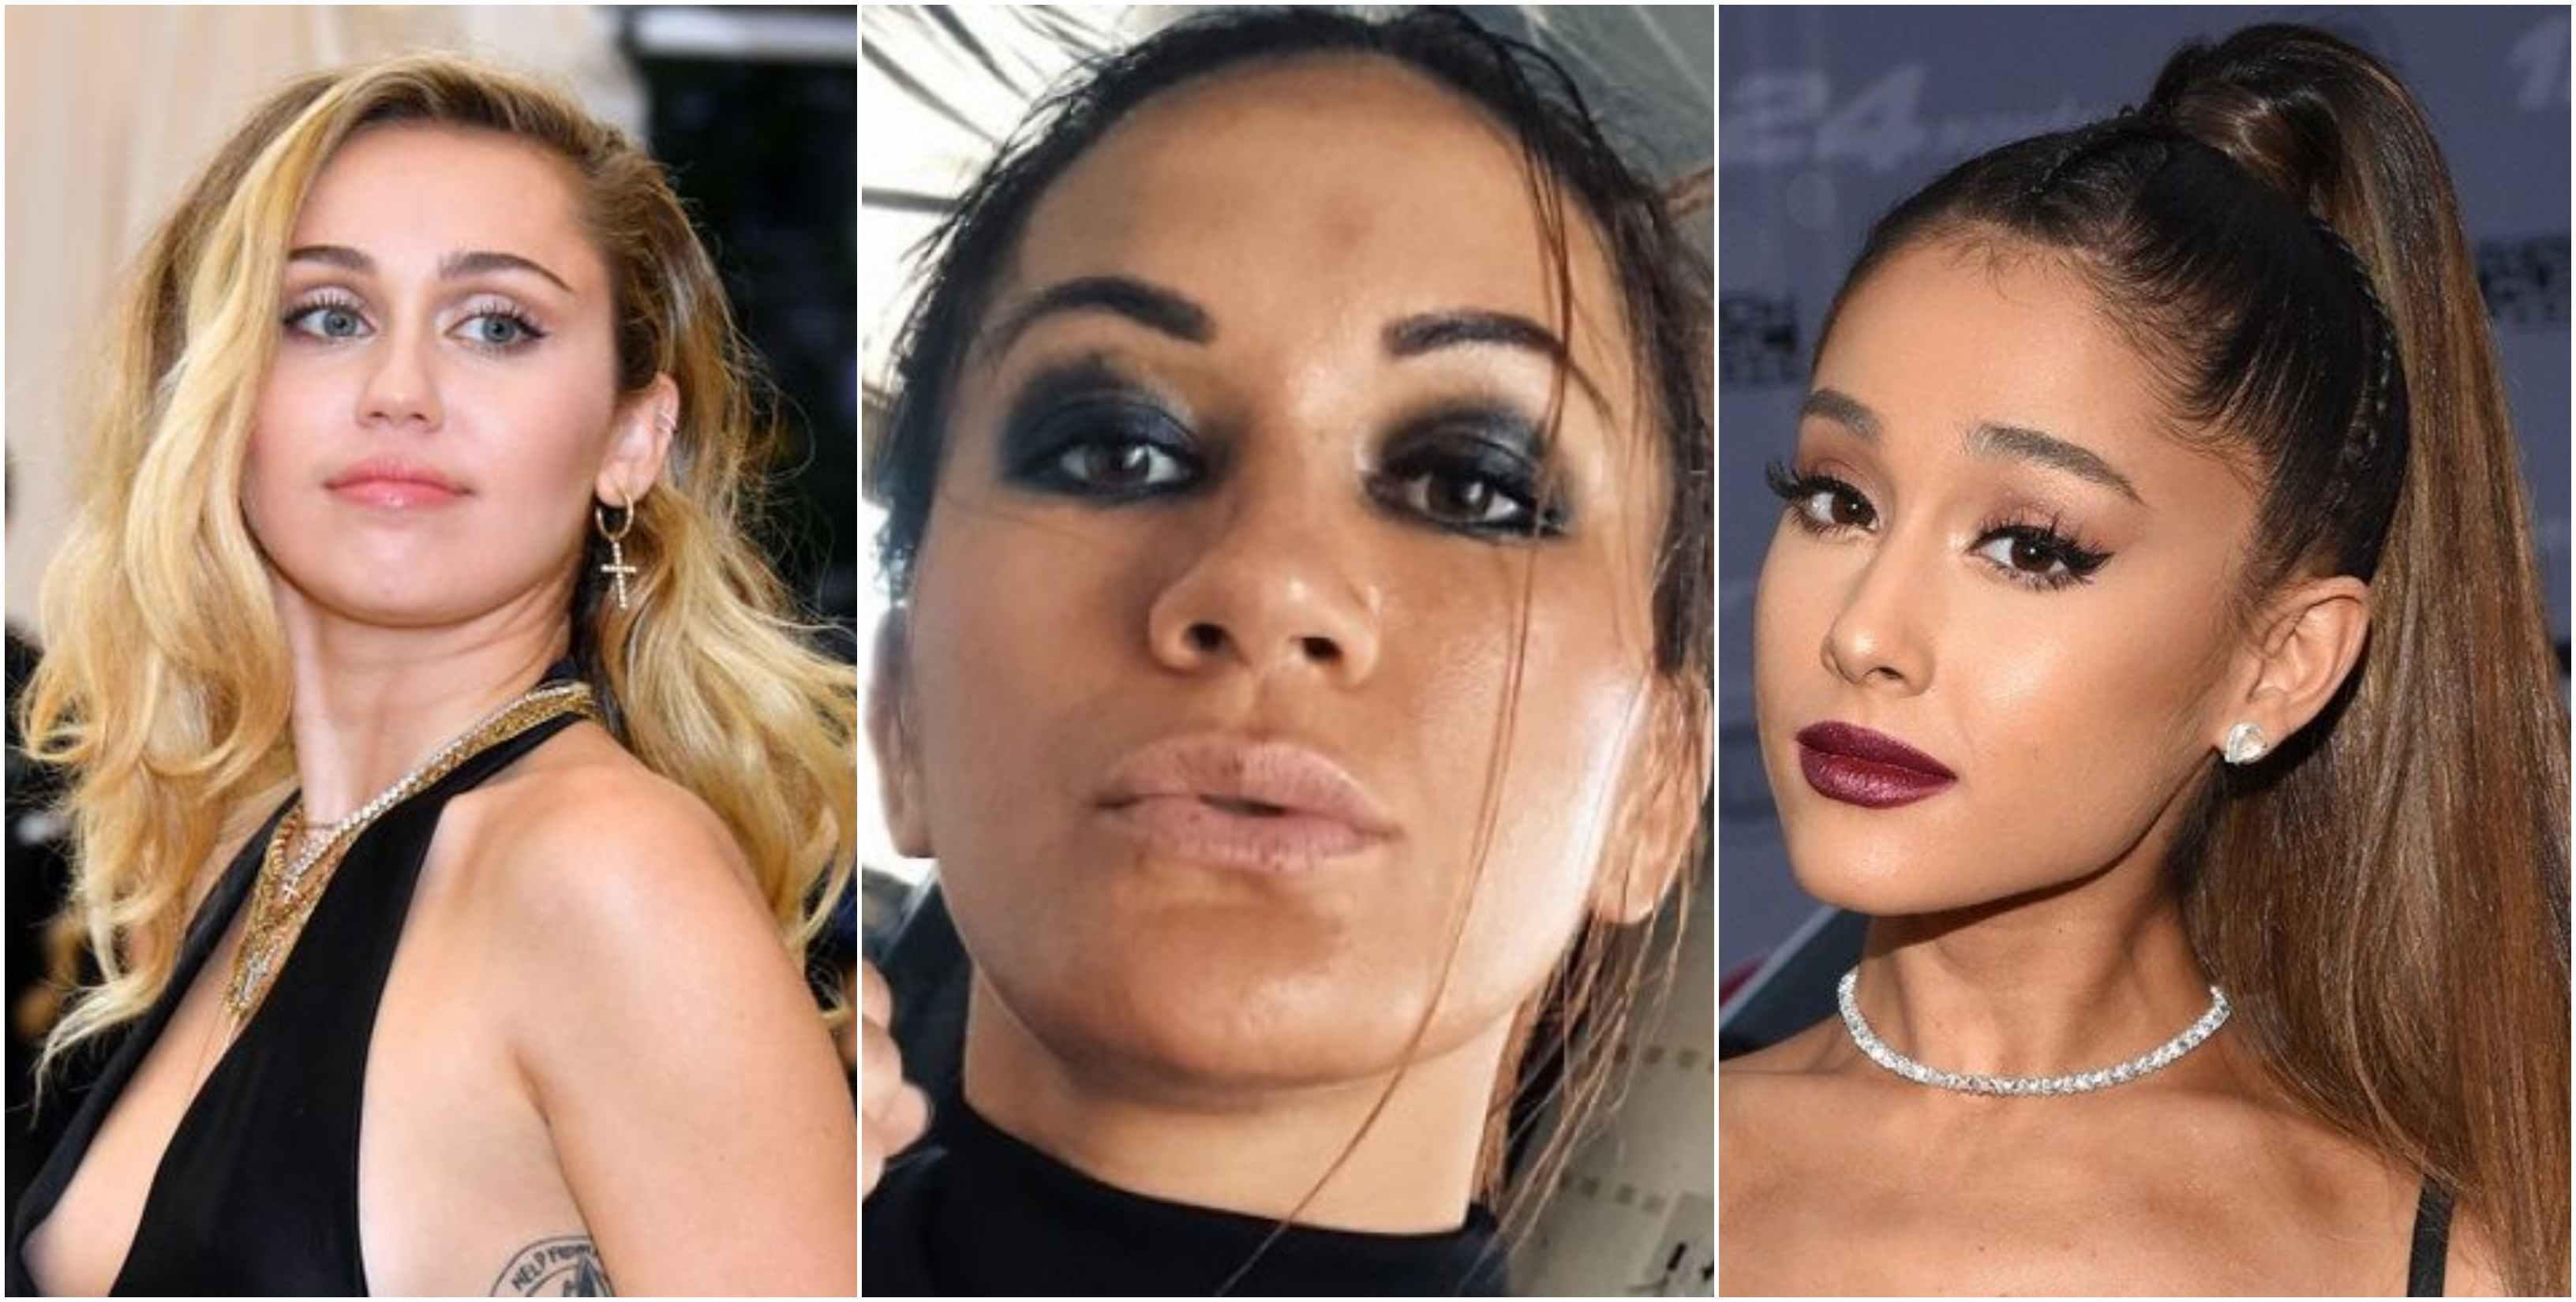 VIDEO: Bellator champ Ilima Lei Macfarlane in a music video with Ariana Grande, Miley Cyrus and Lana del Rey - Ilima